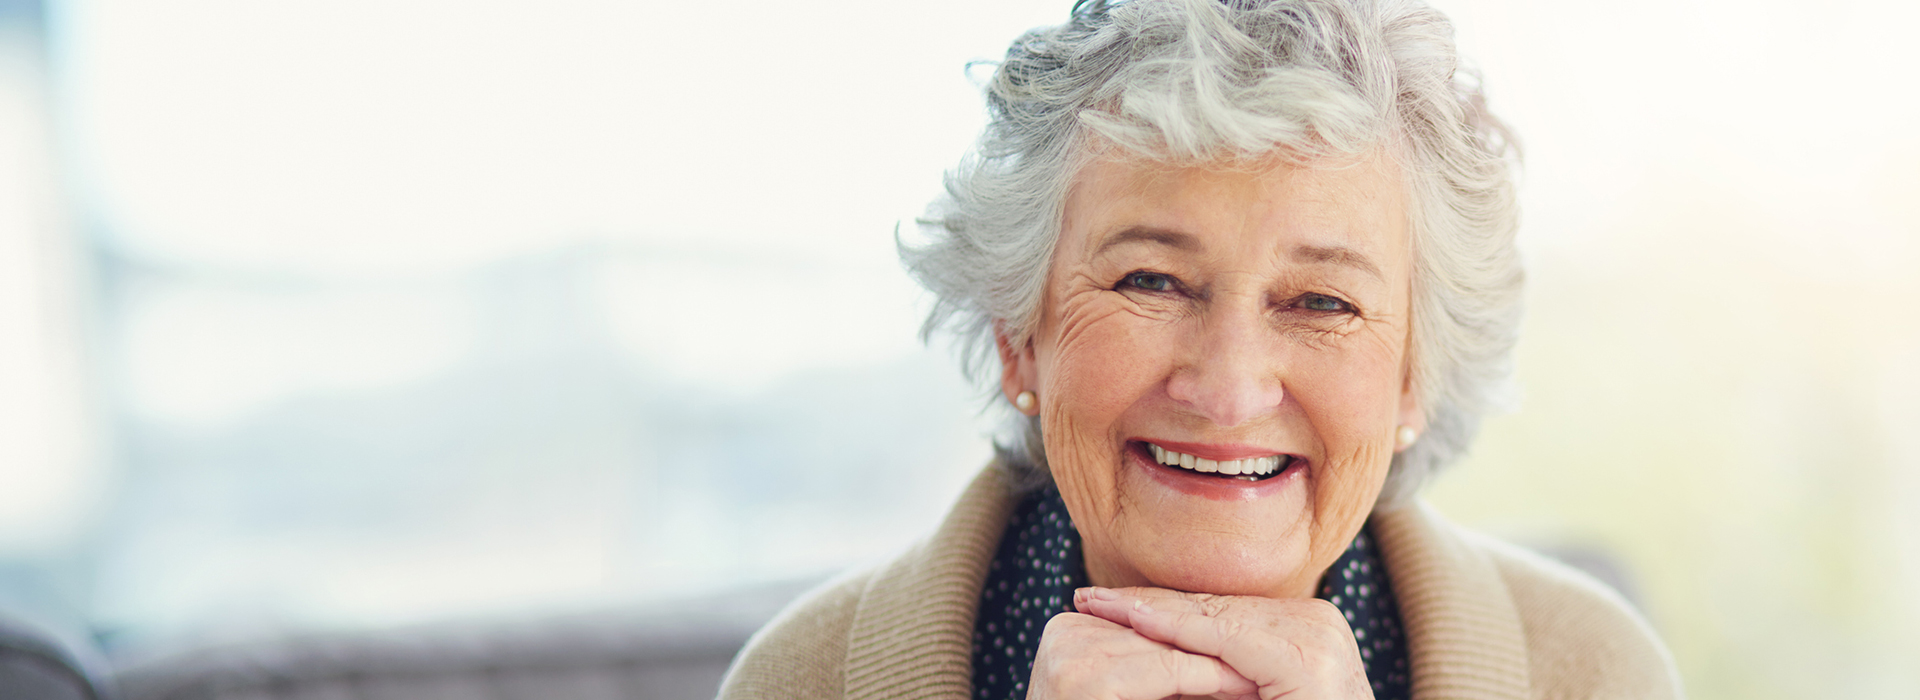 image of a happy female senior